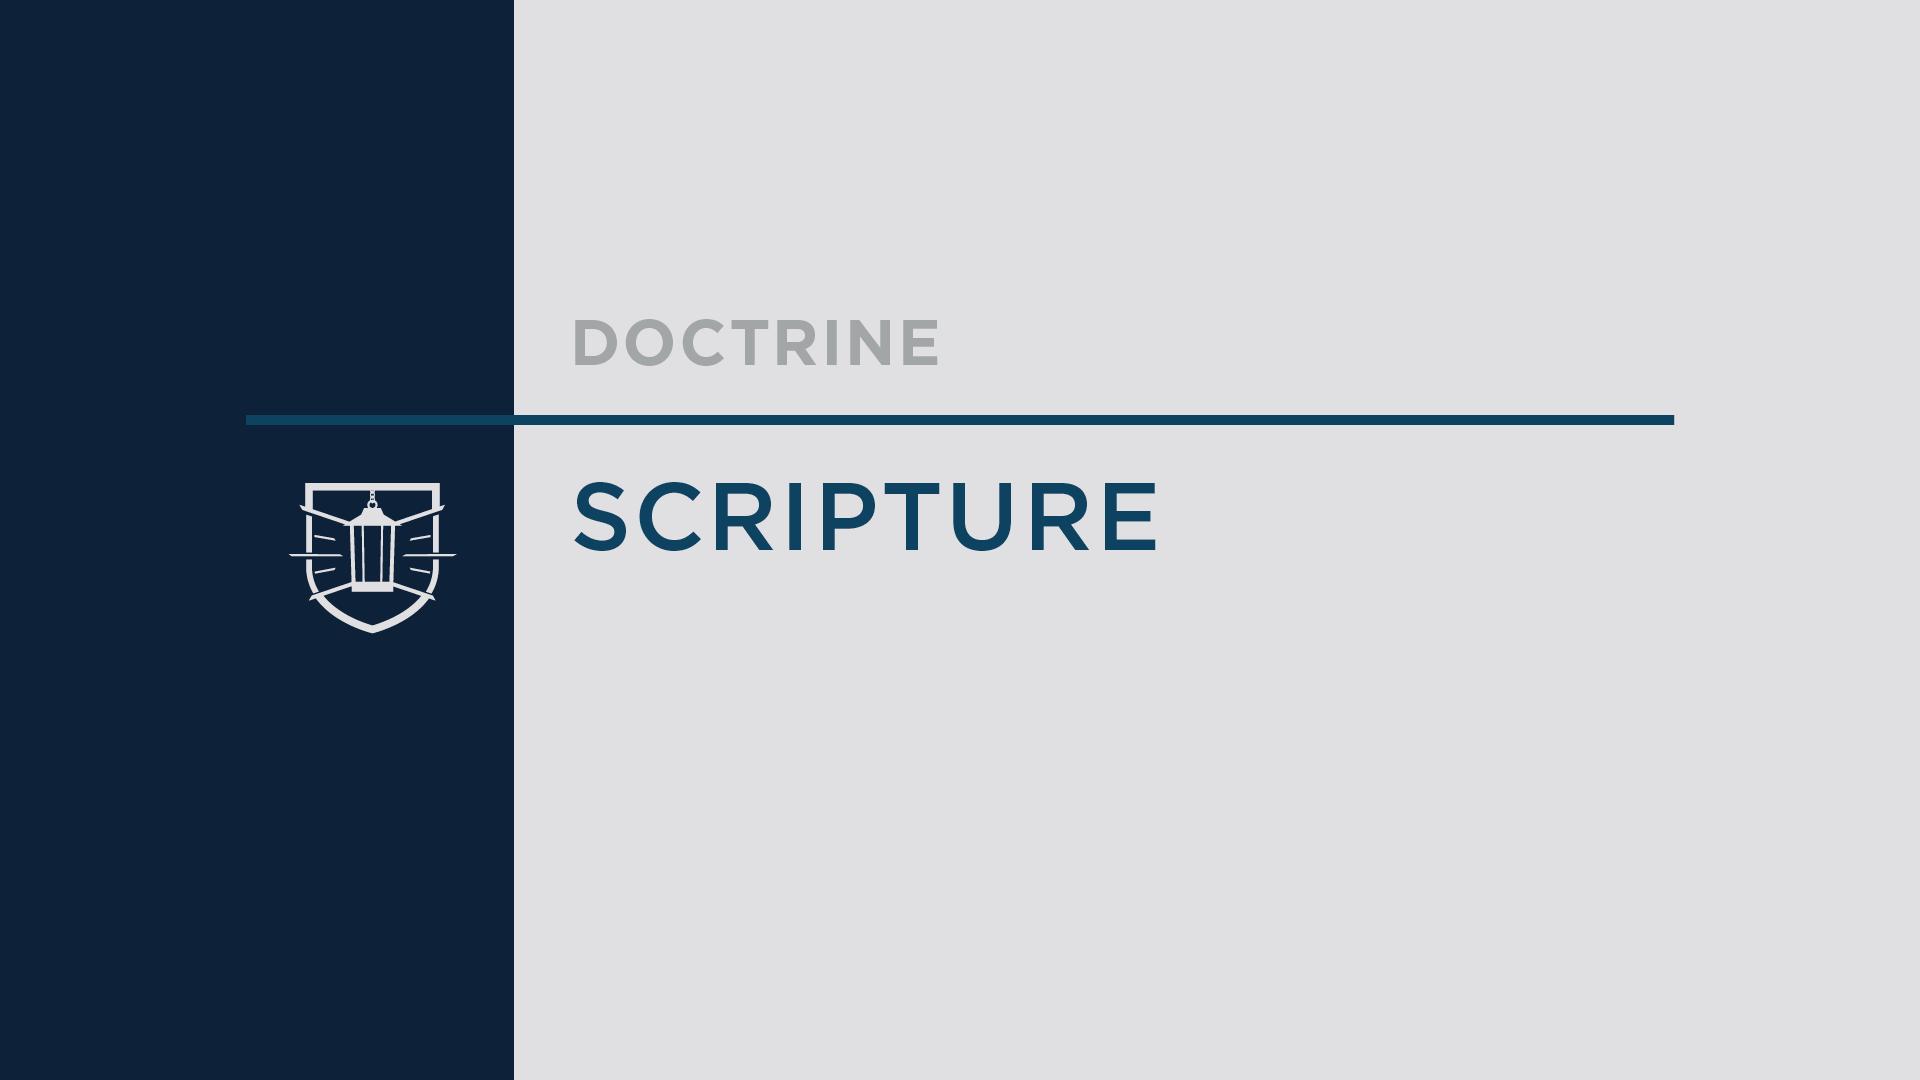 Doctrine 2: Scripture